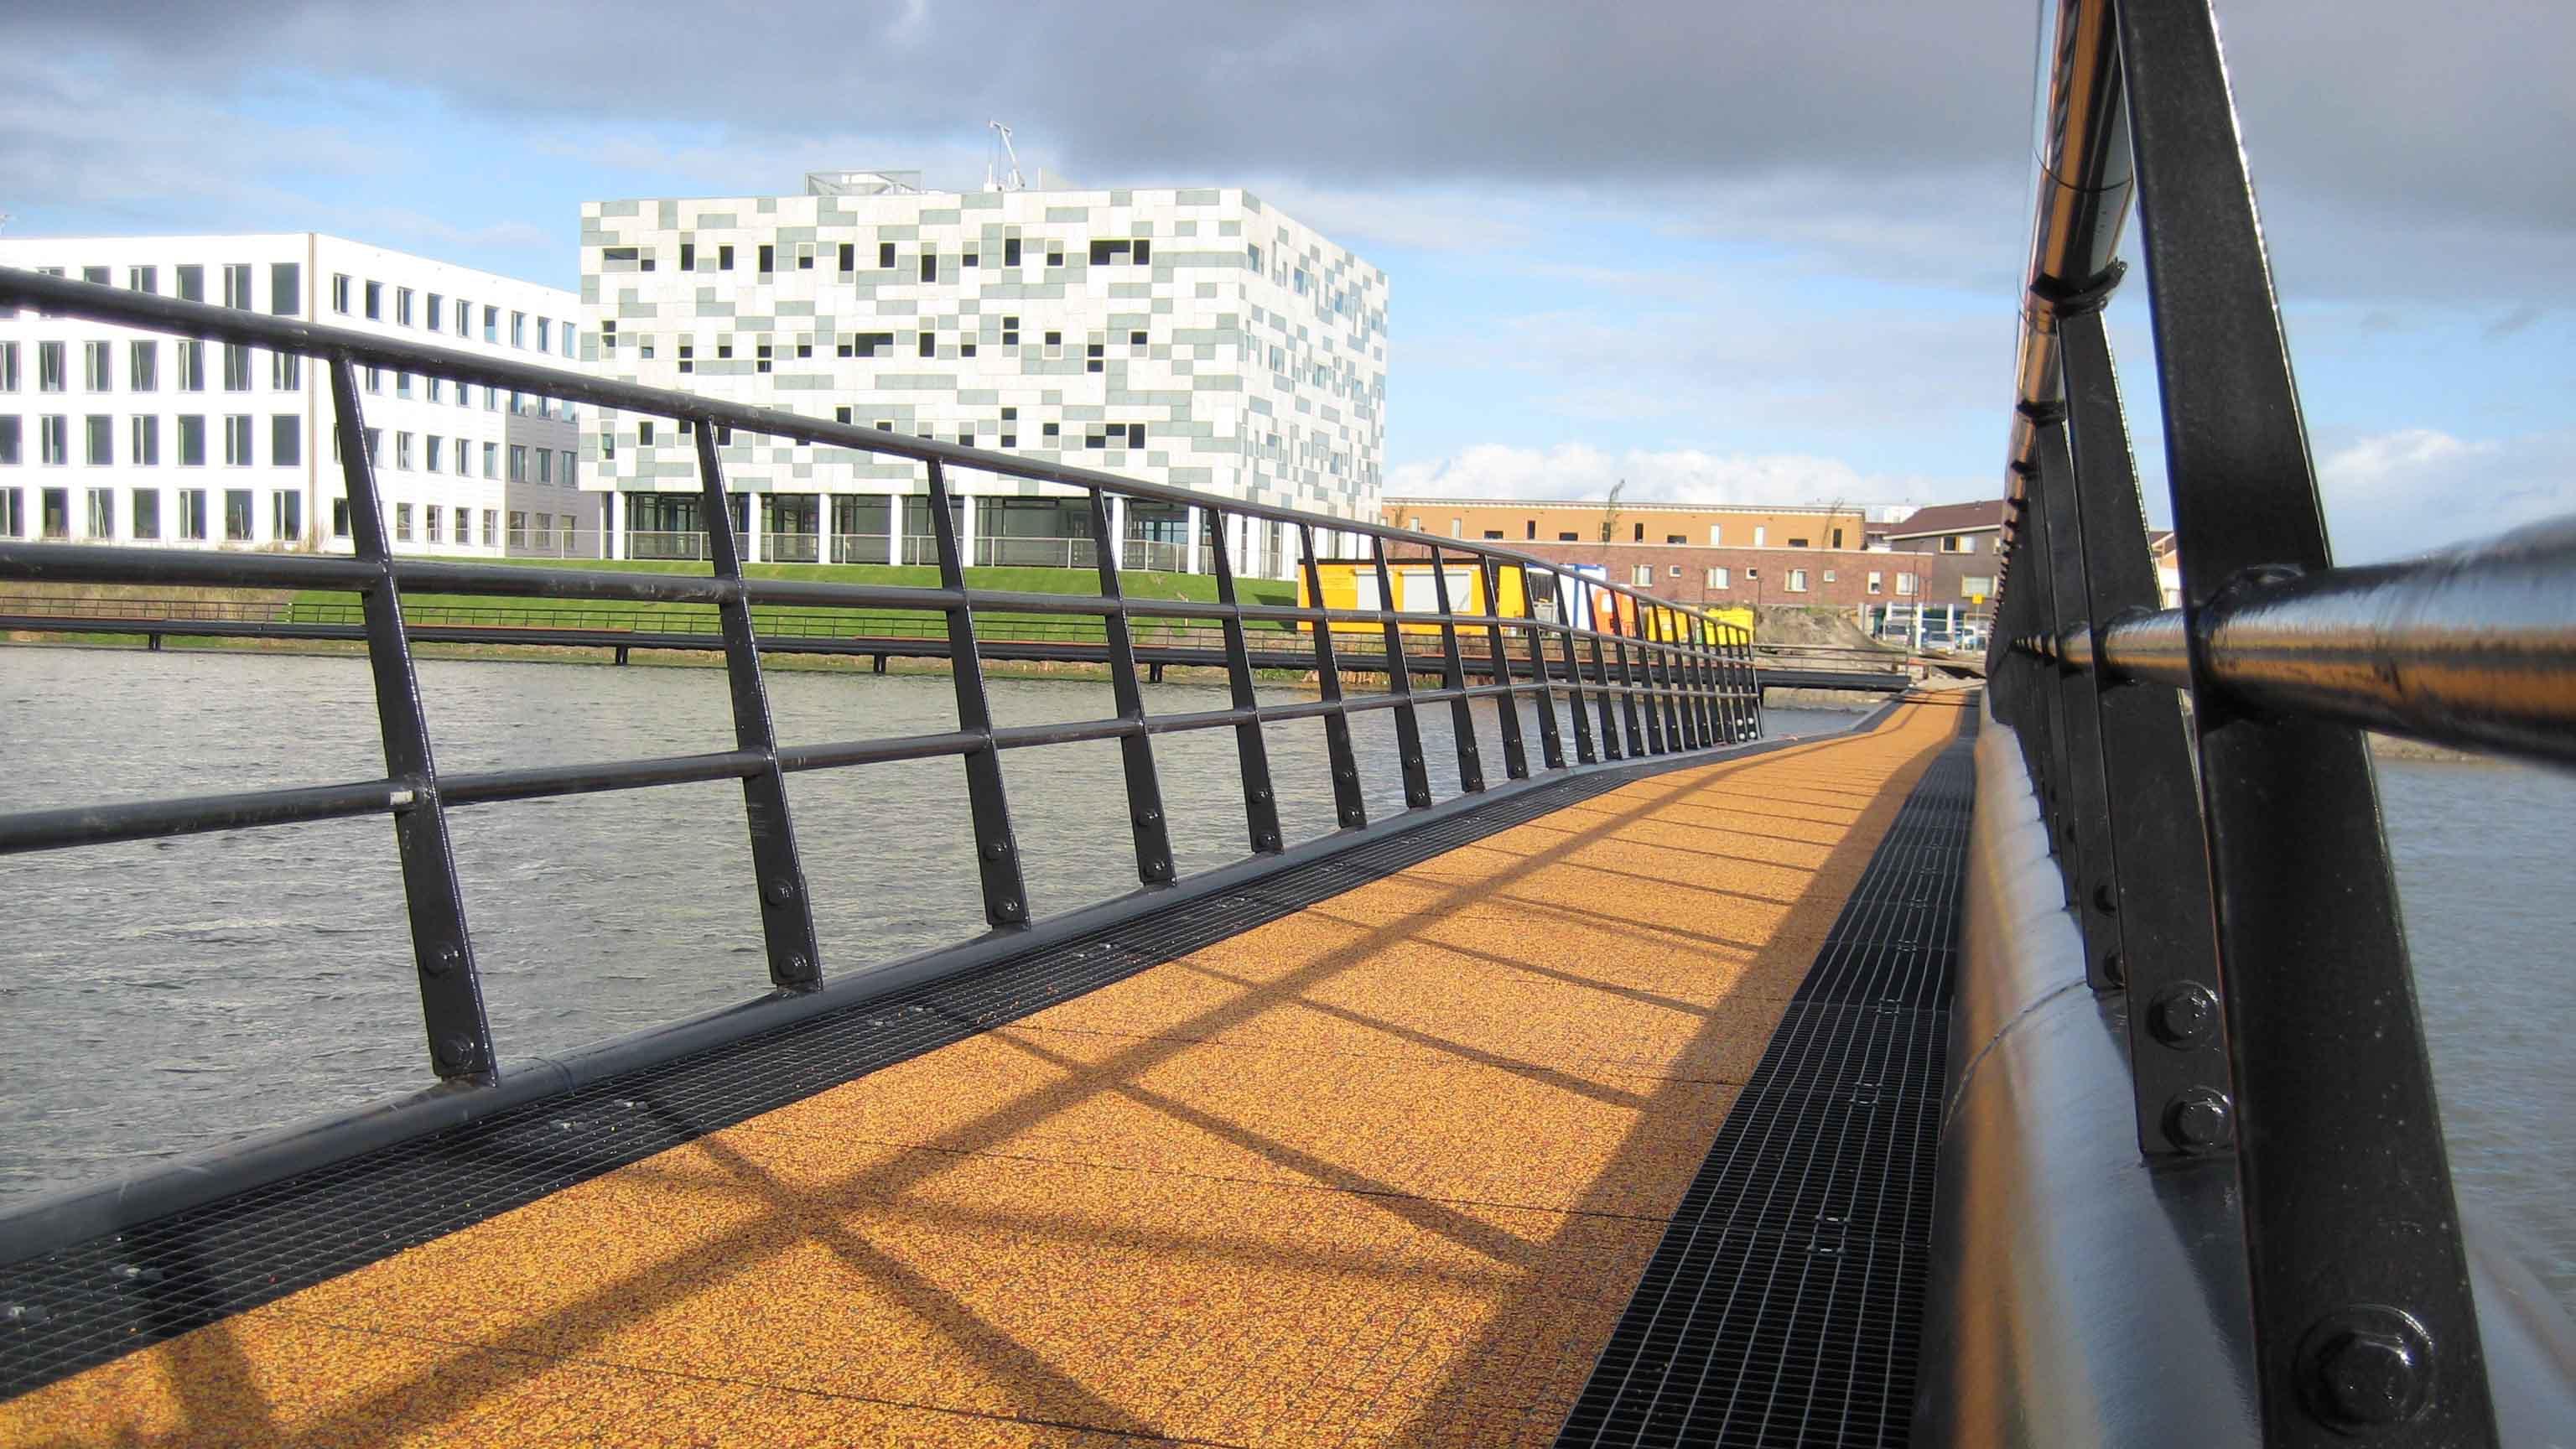 boardwalk brainpark capelle ad ijssel architect marja haring